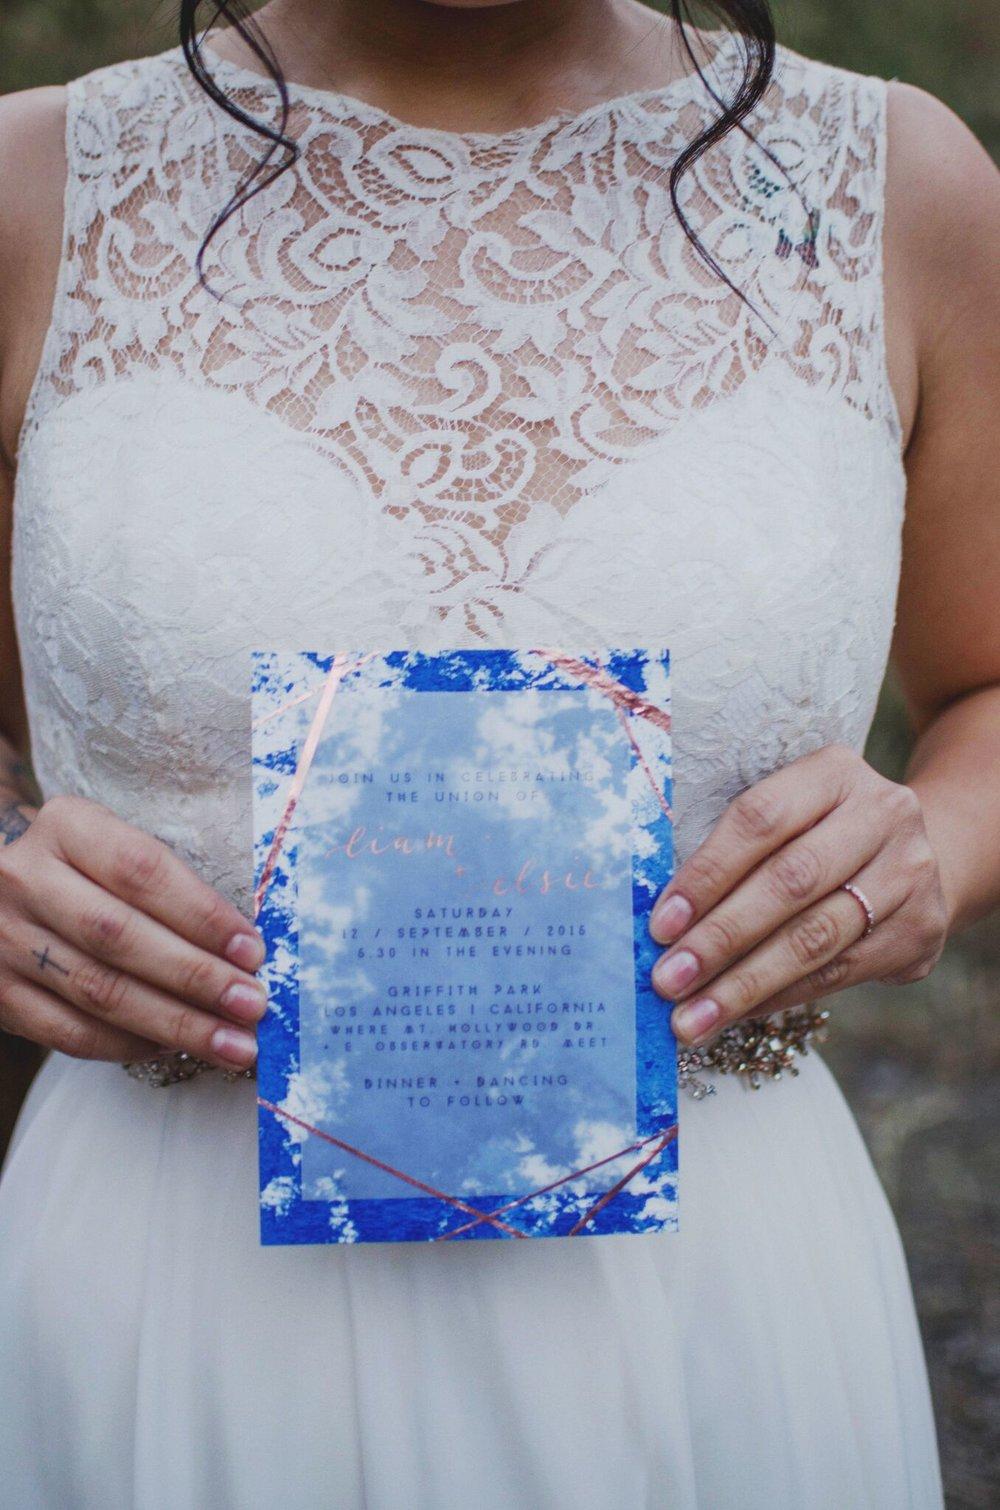 BOHO WEDDING (GRIFFITH PARK)